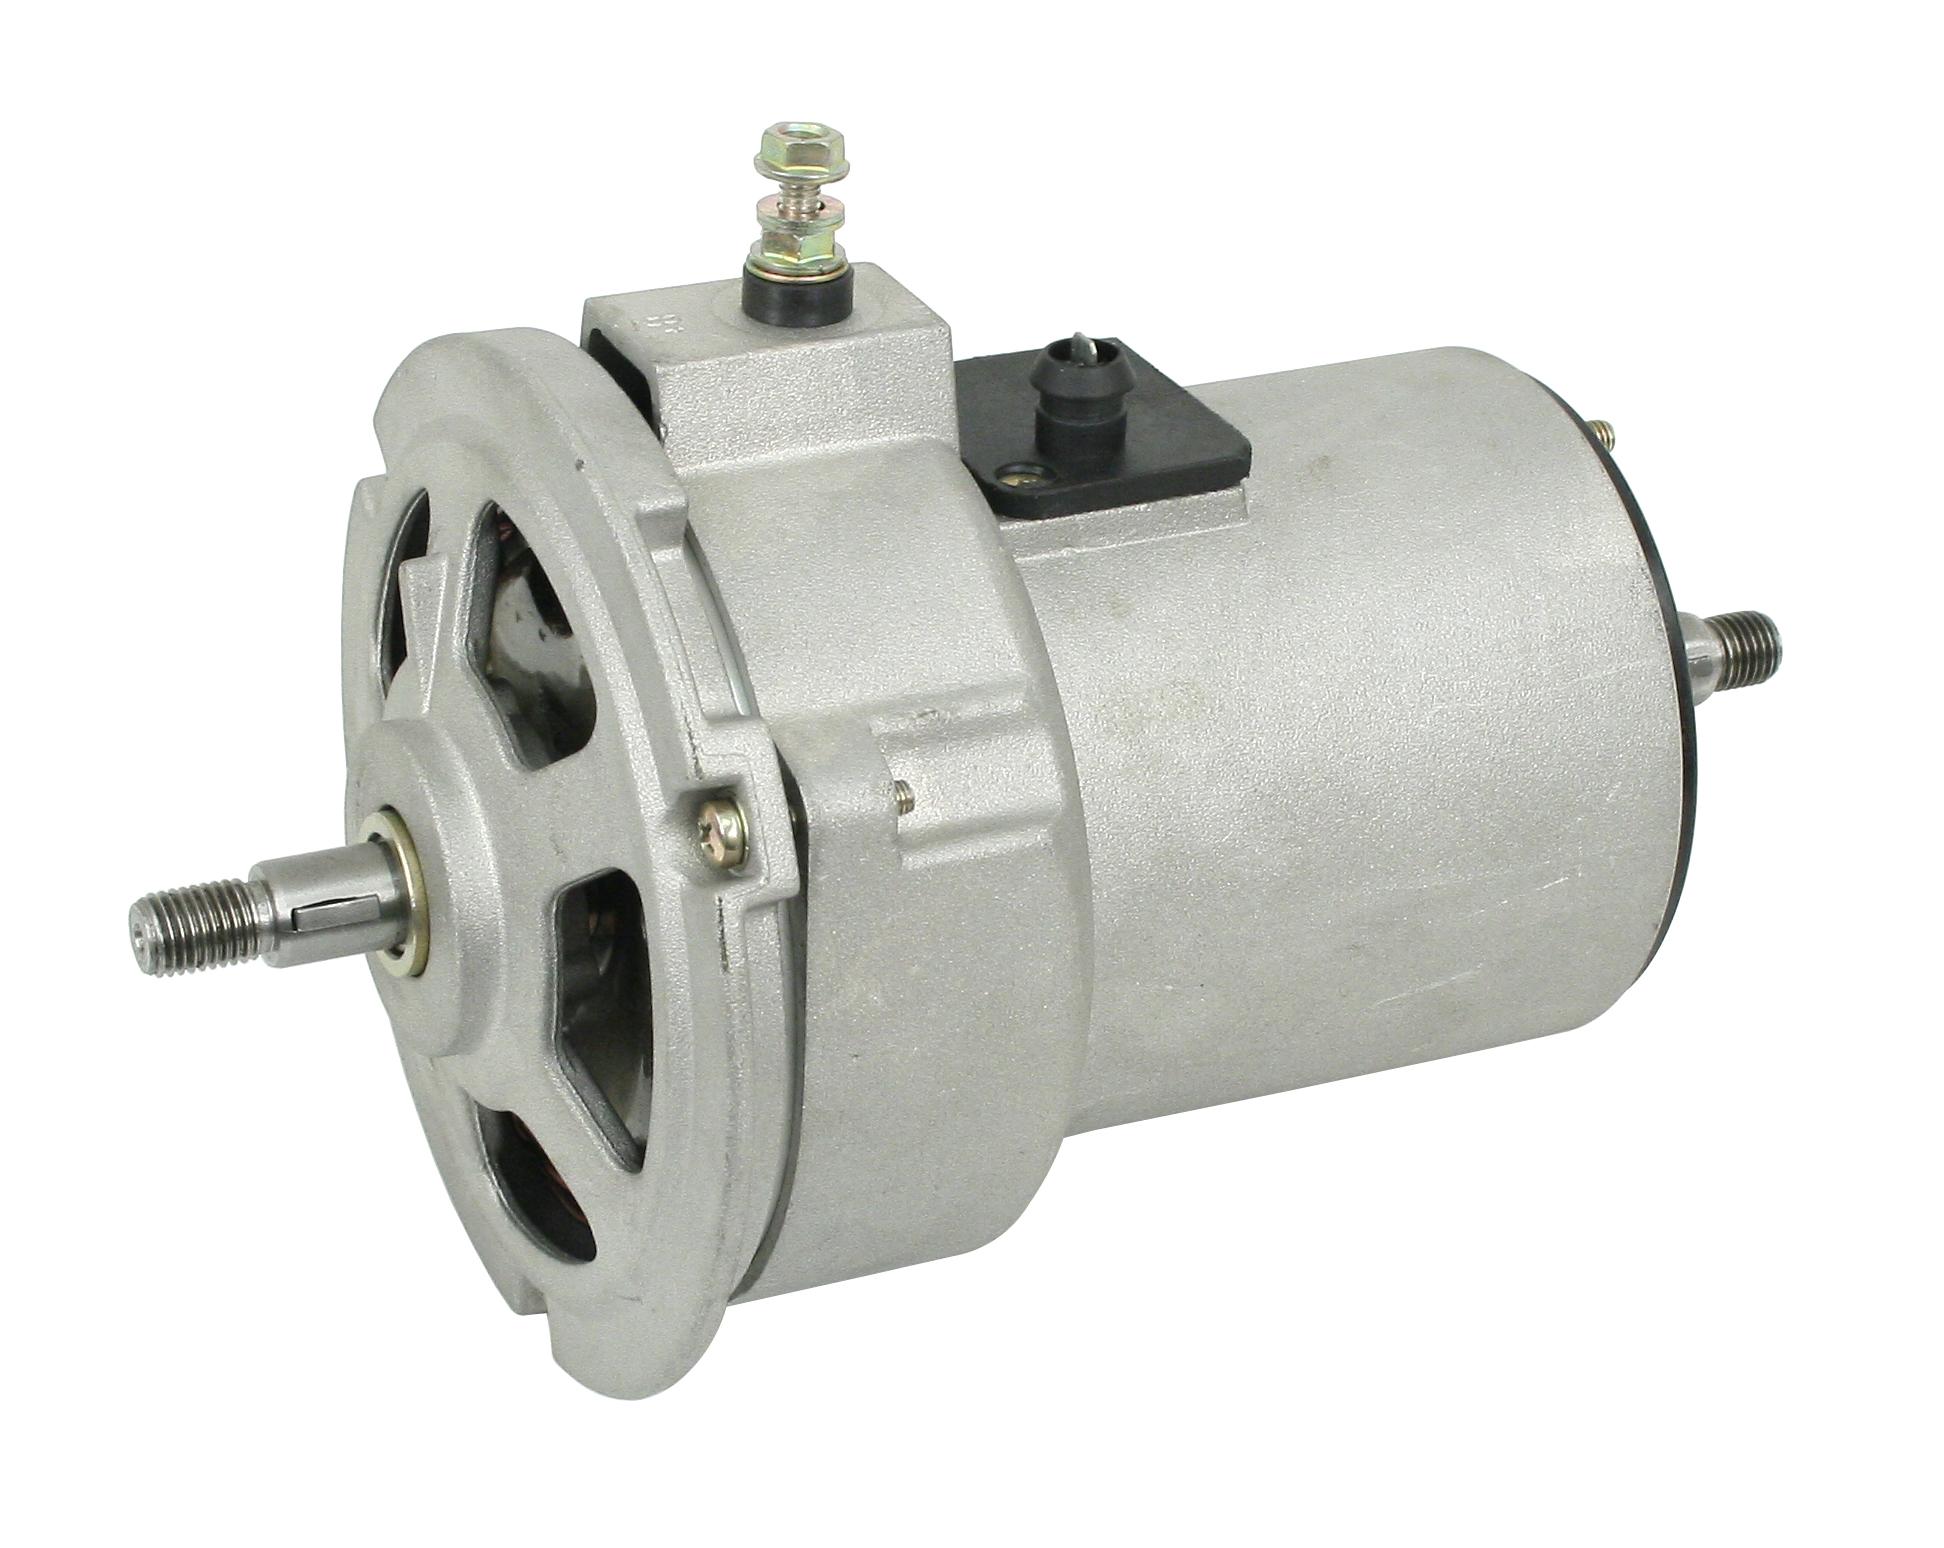 Alternator, 12V - al82n75